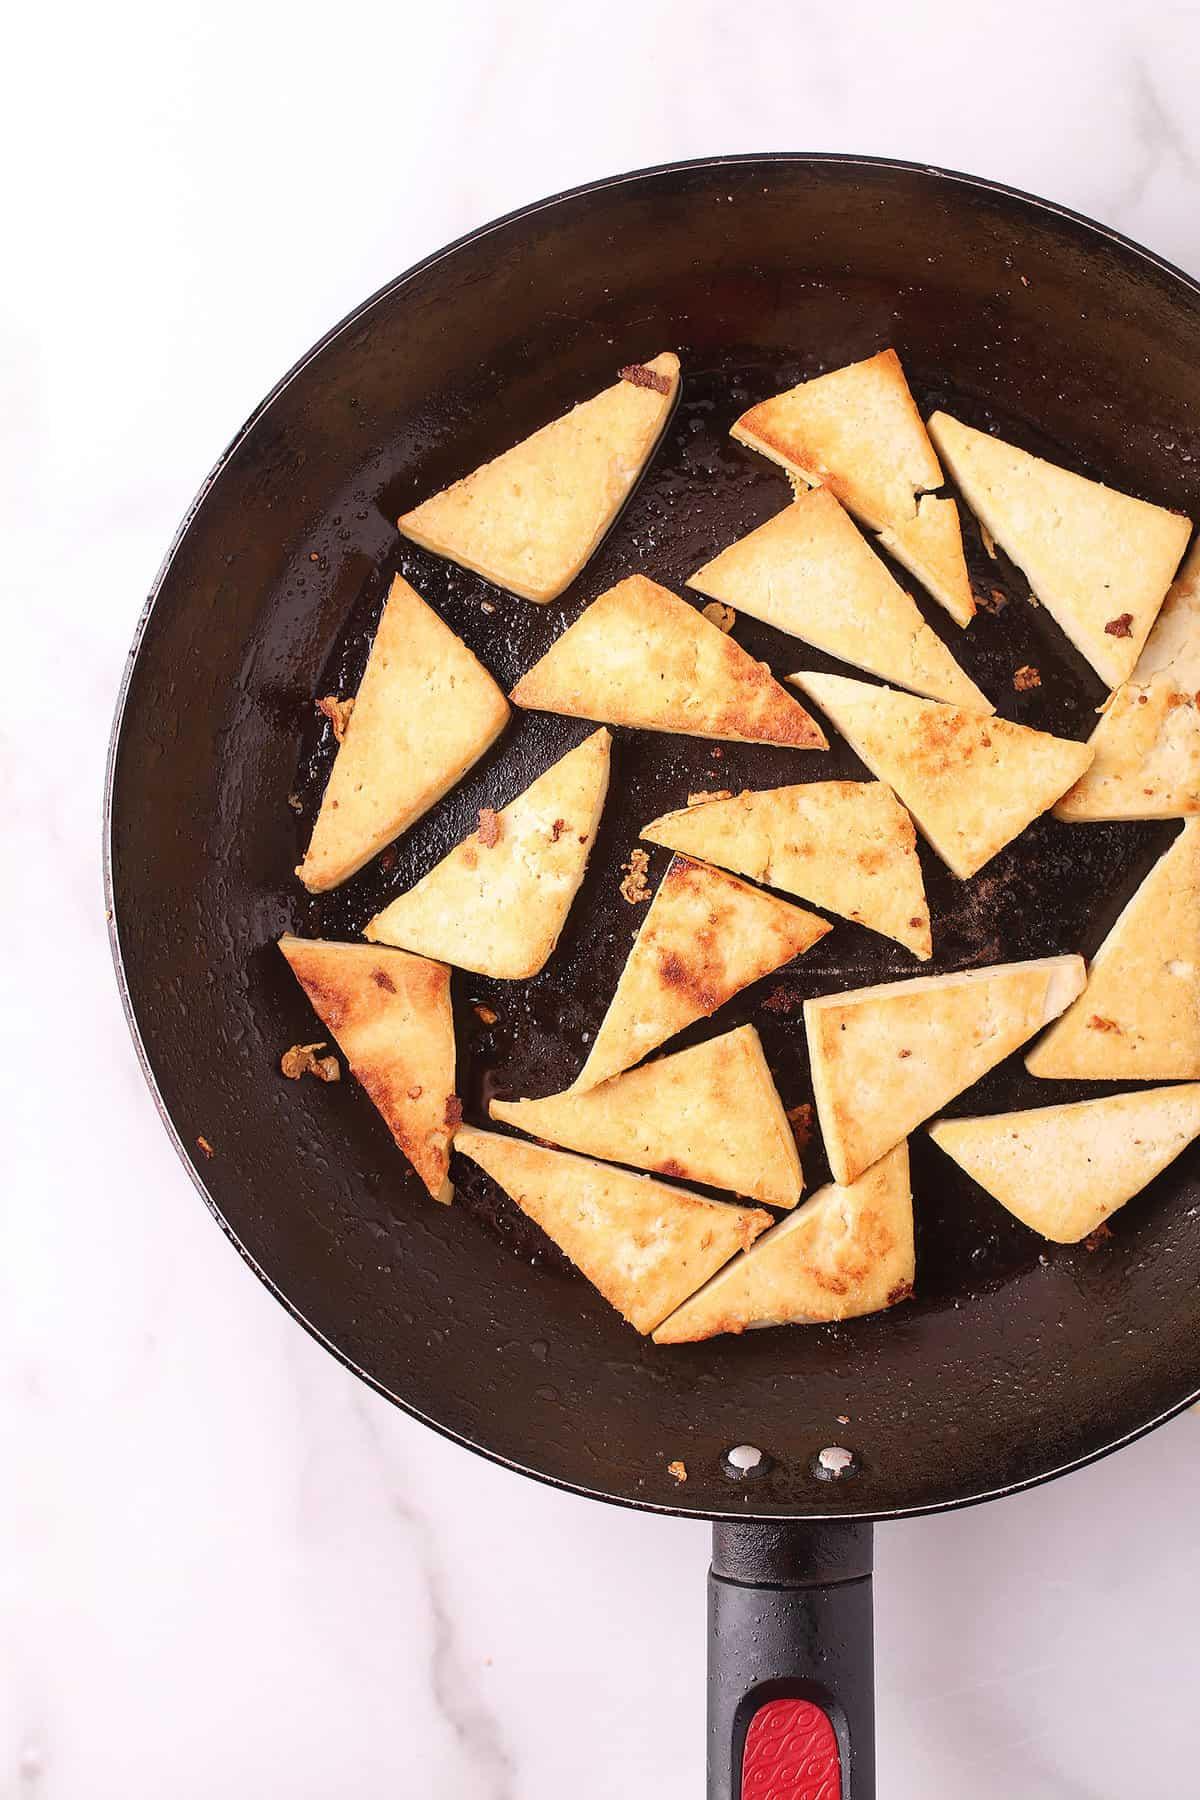 Pan-fried tofu triangles